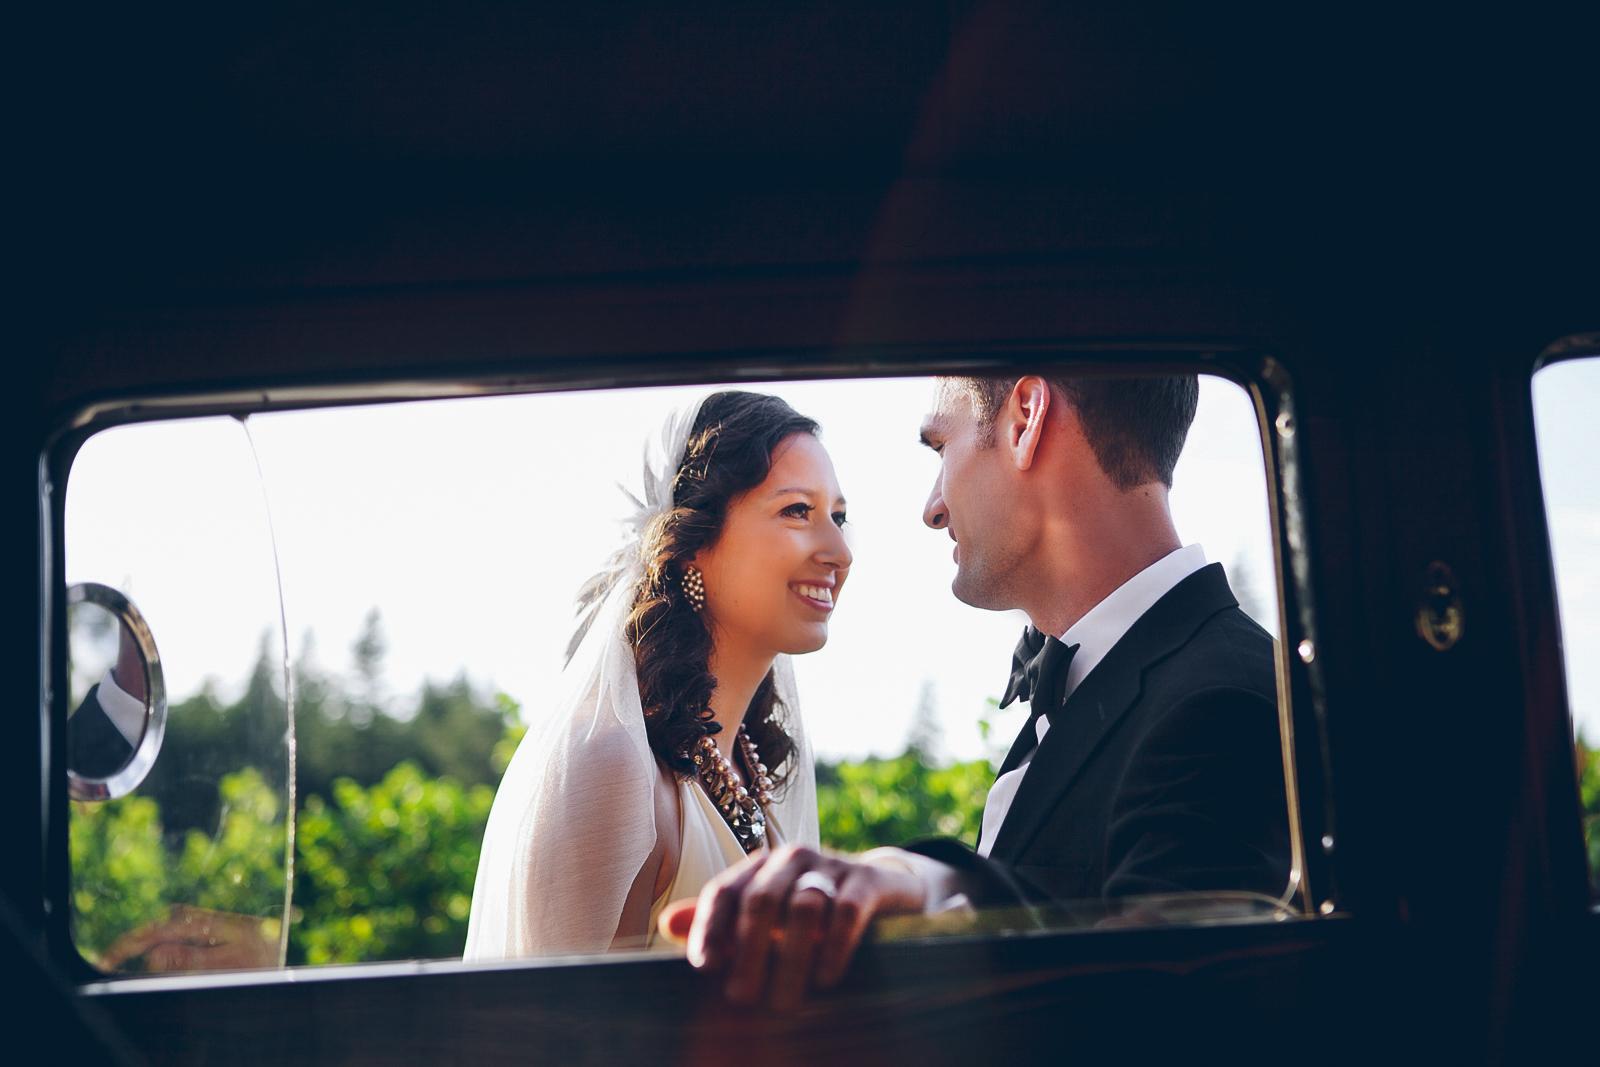 miraflores_winery_wedding_photography_ian_melissa_ebony_siovhan_bokeh_photography_50.jpg